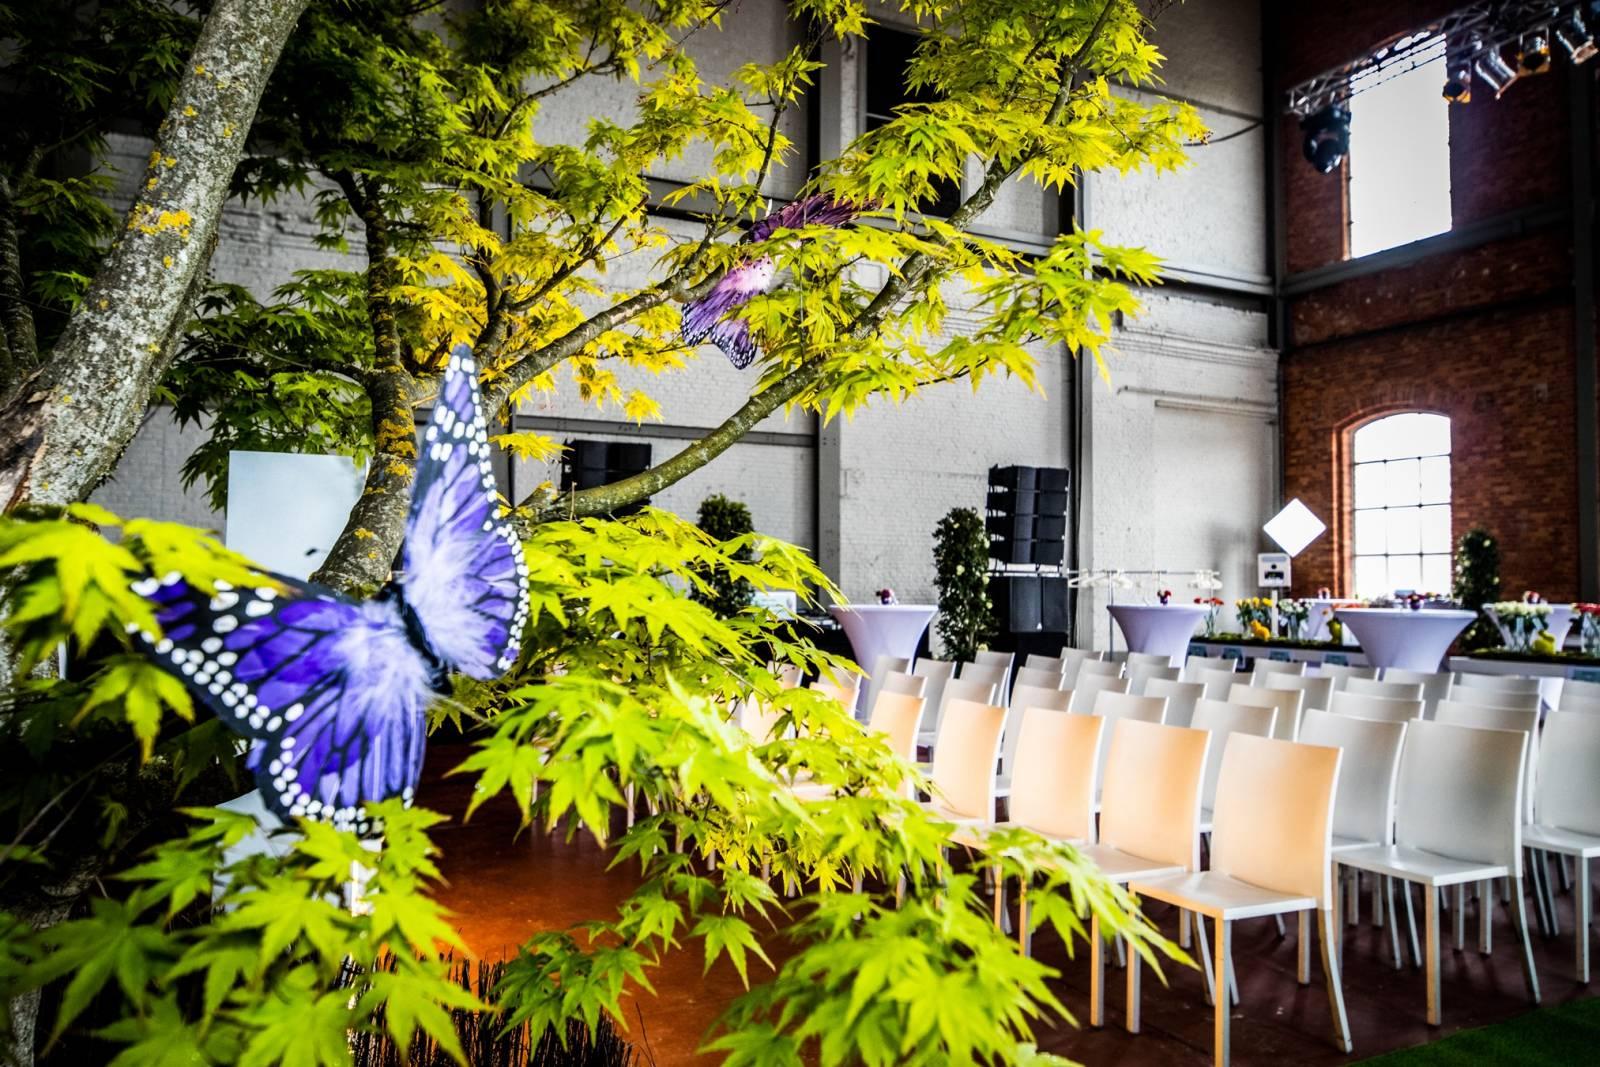 Hangar 43 - Feestzaal Oost-Vlaanderen - Industrieel - House of Weddings - 5